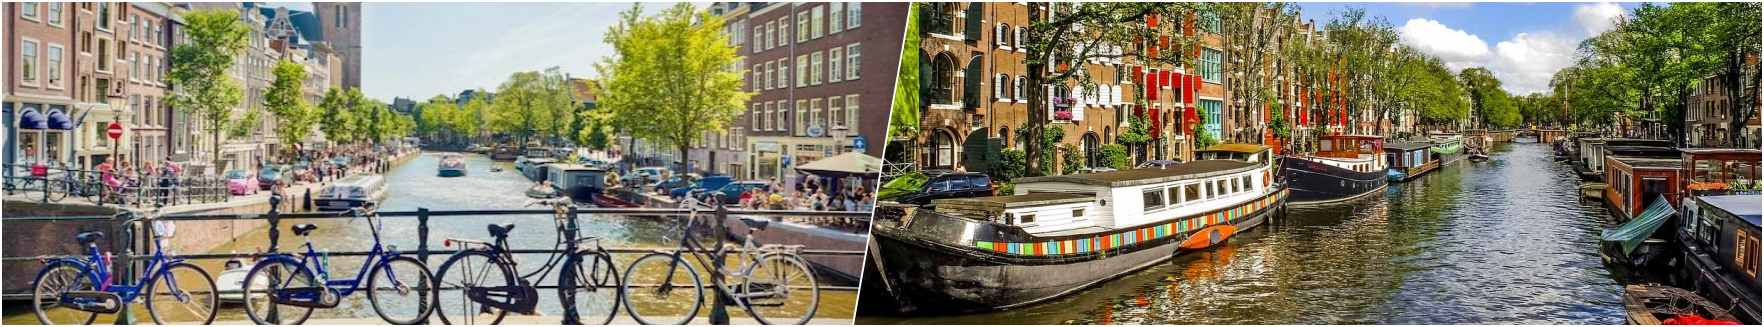 Amsterdam - Canal Cruise